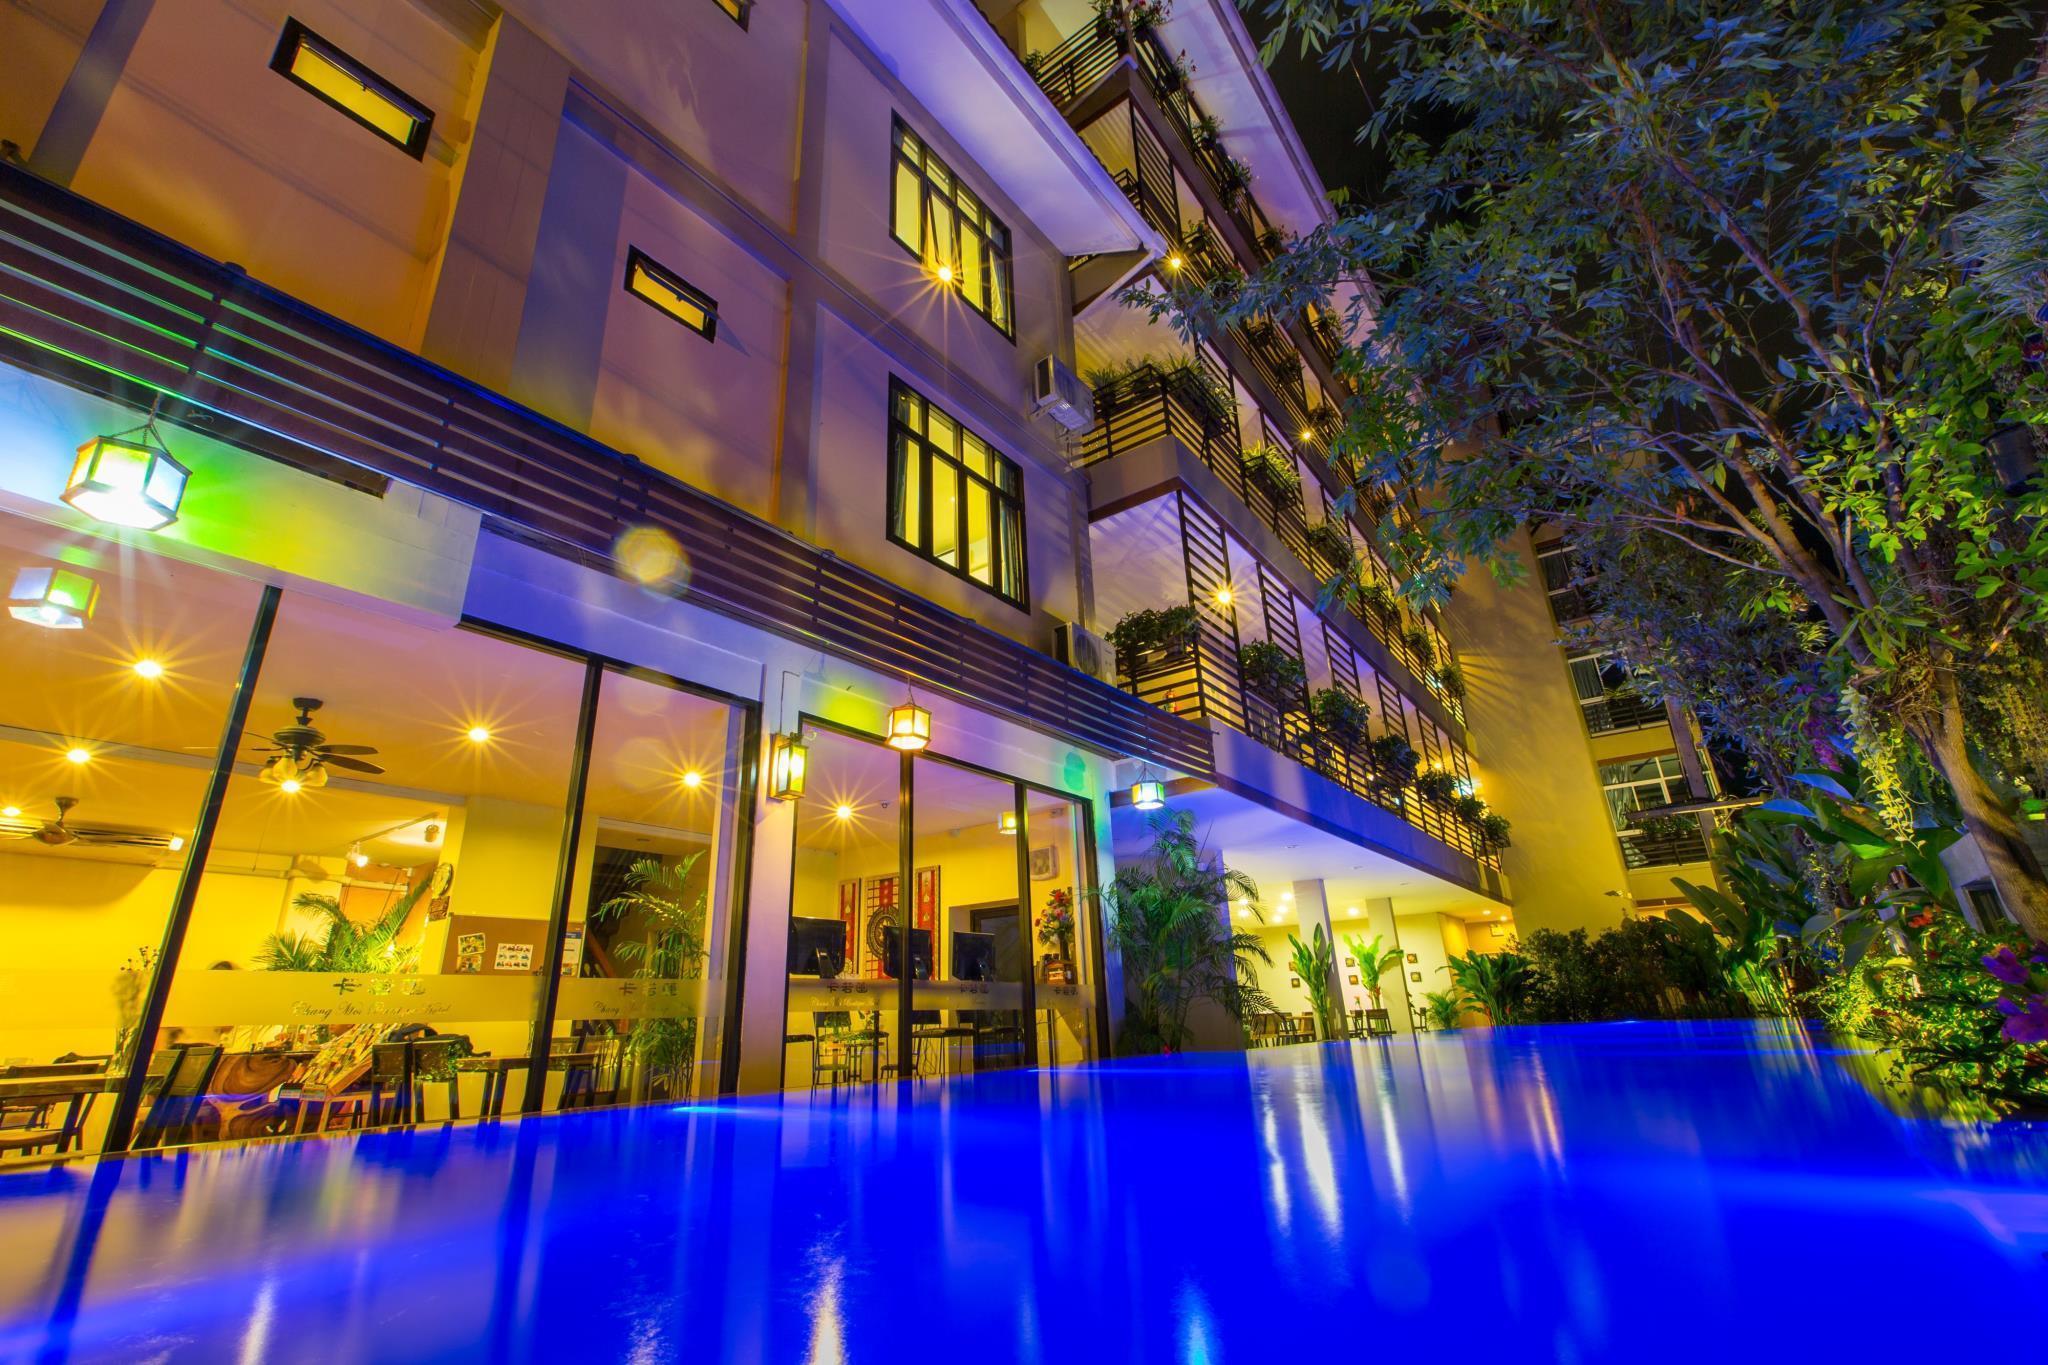 Karou Lotus Hotel โรงแรมคาโร โลตัส